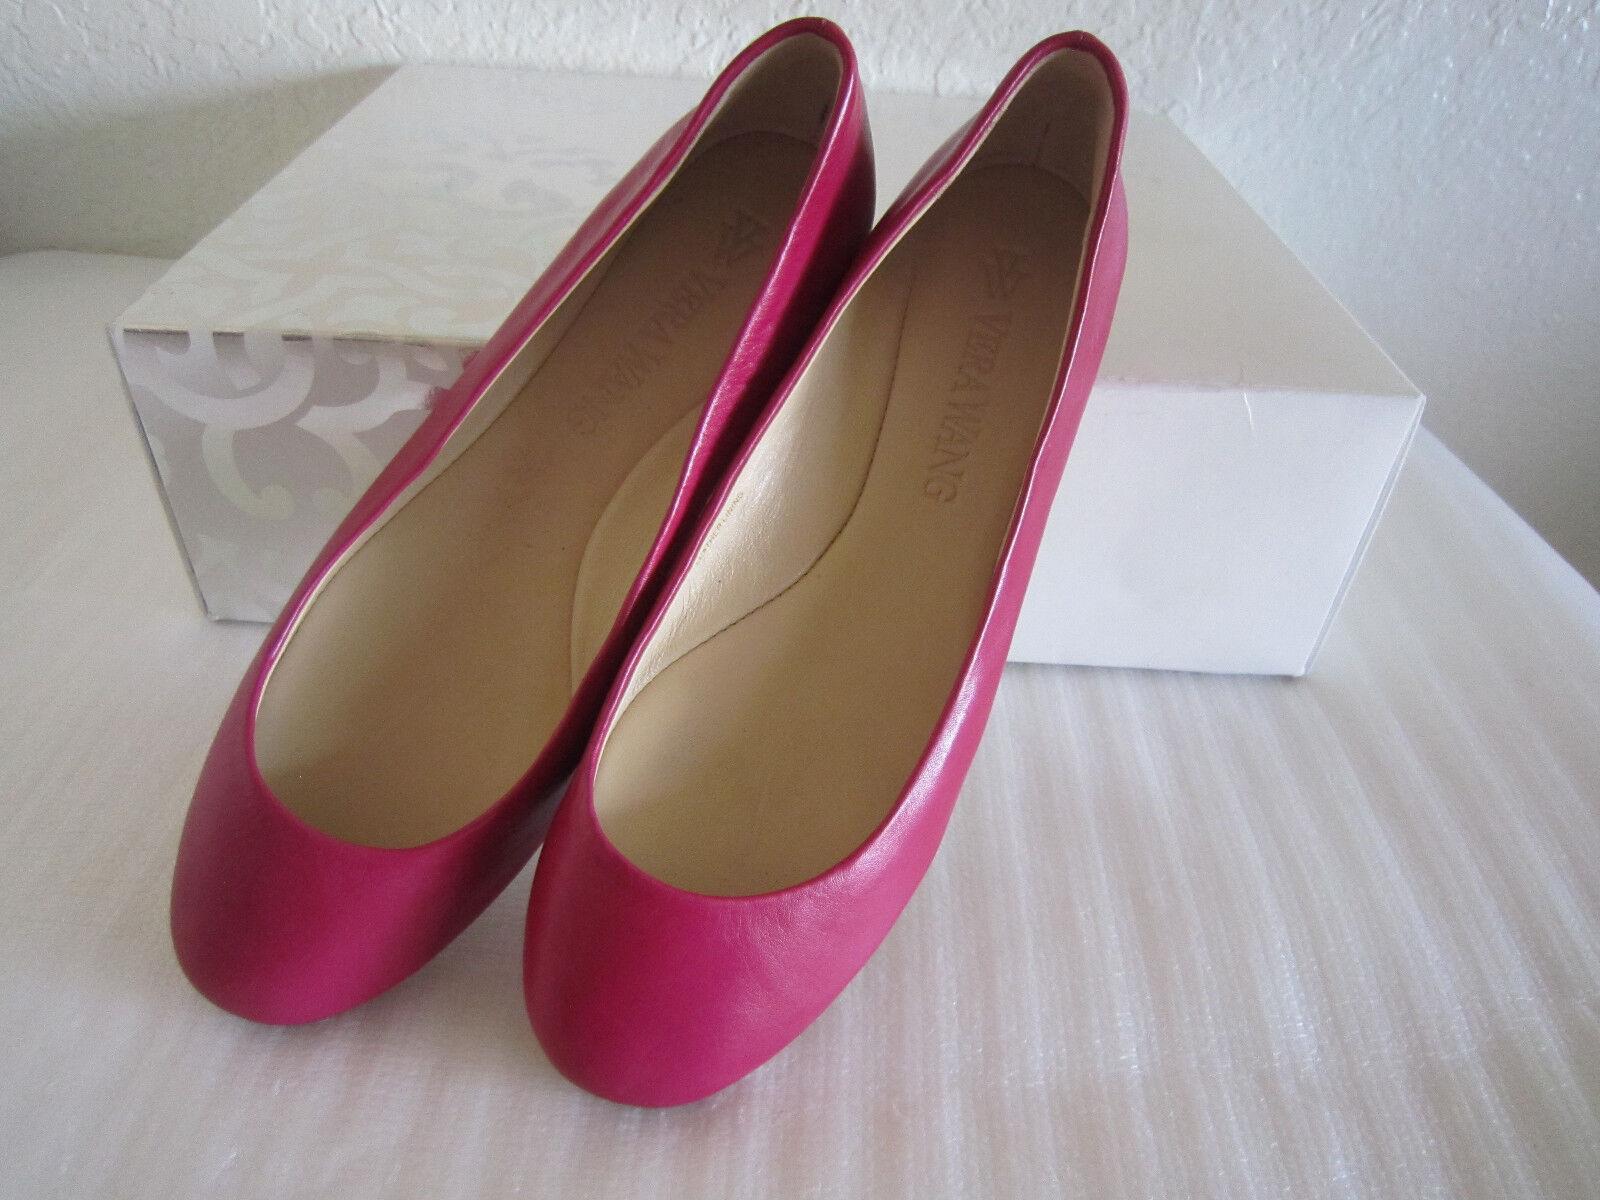 vera vera vera wang lara cerise doux cuir chaussures de créateur des ballerines 6 femmes bad01e